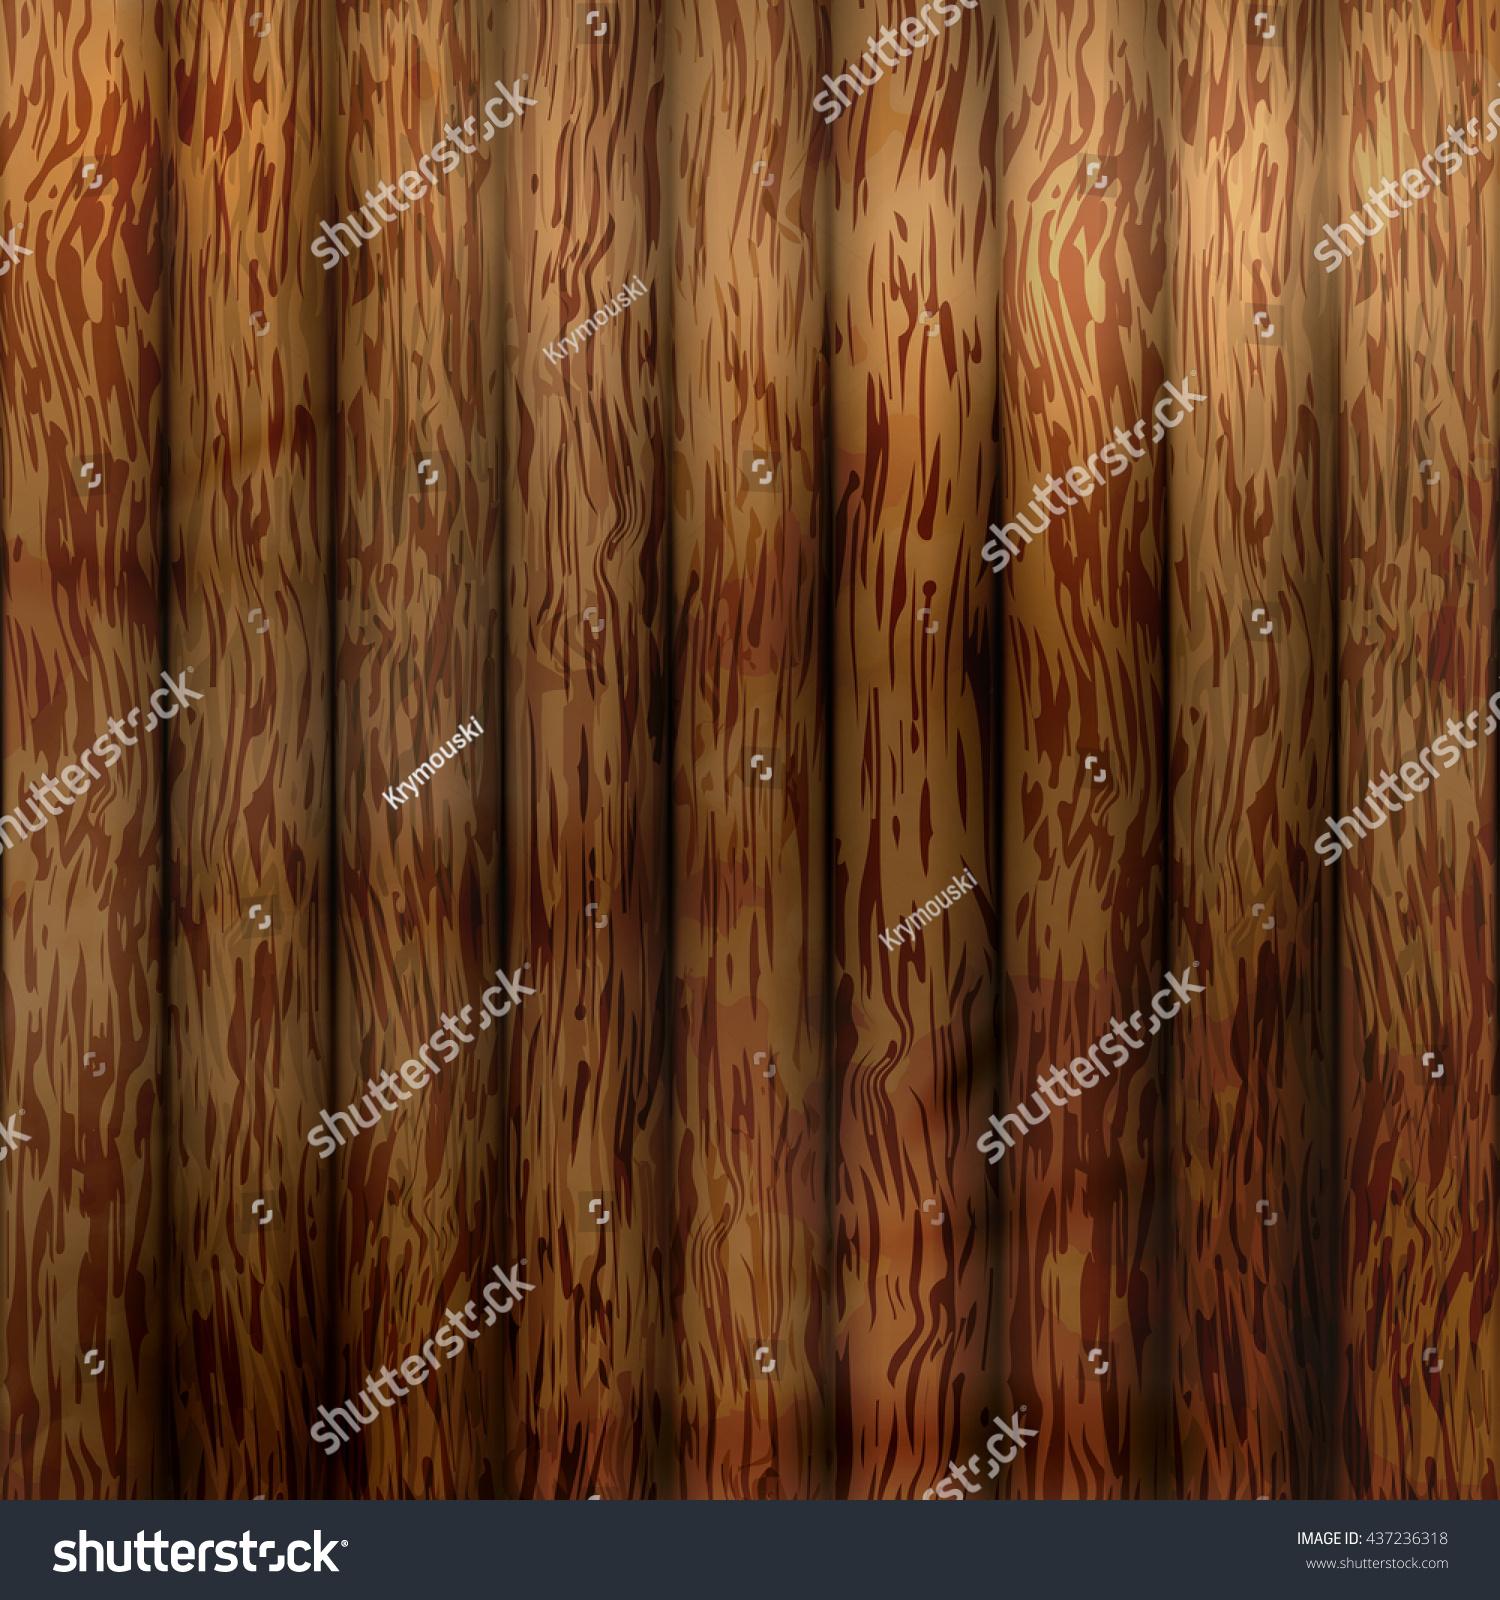 Wood Plank Texture Background Vector Illustration Stock Vector